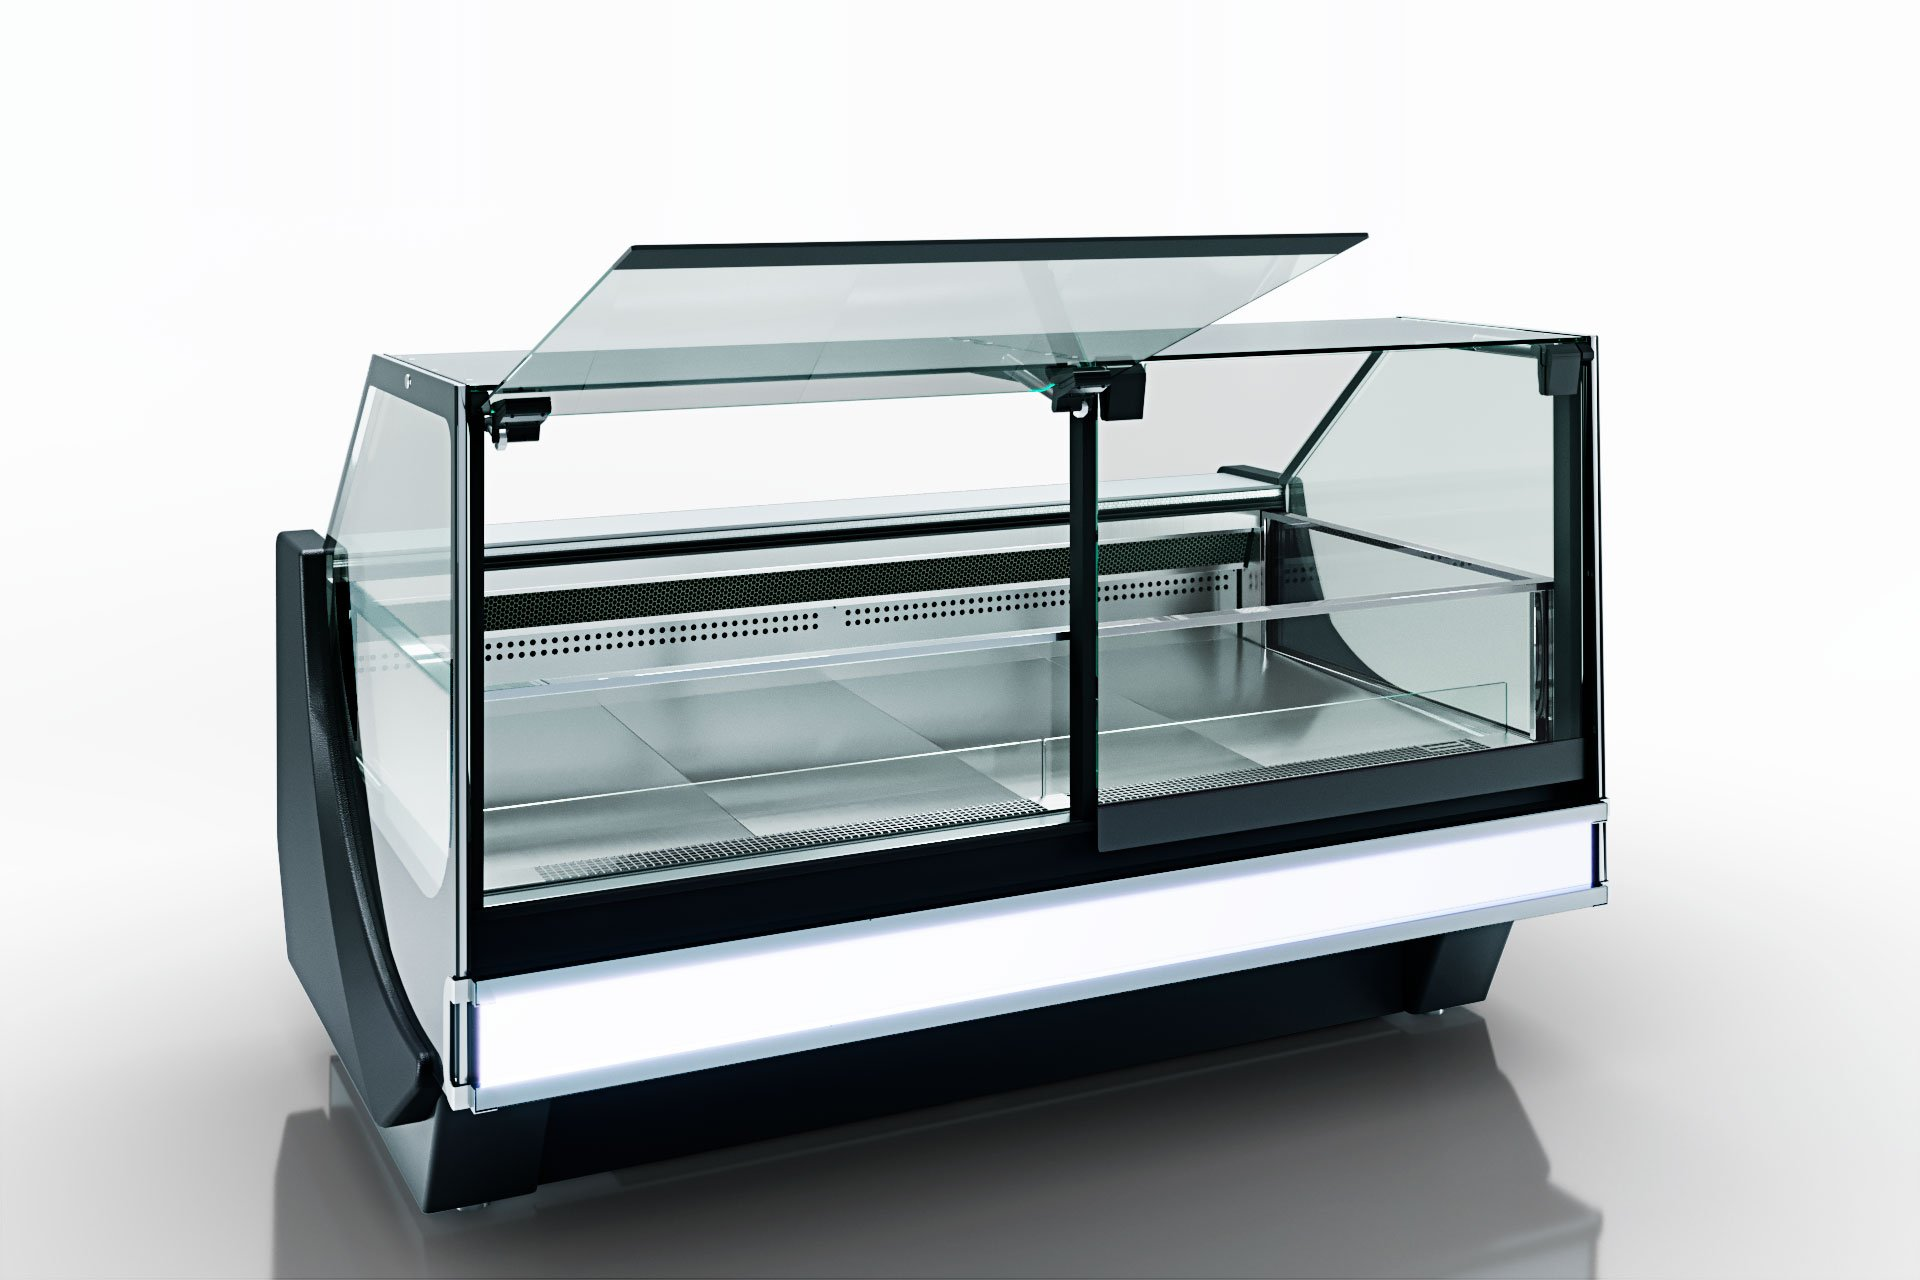 מקפיא תעשייתי MISSOURI COLD DIAMOND MC 115 LT PS M/A – NEW